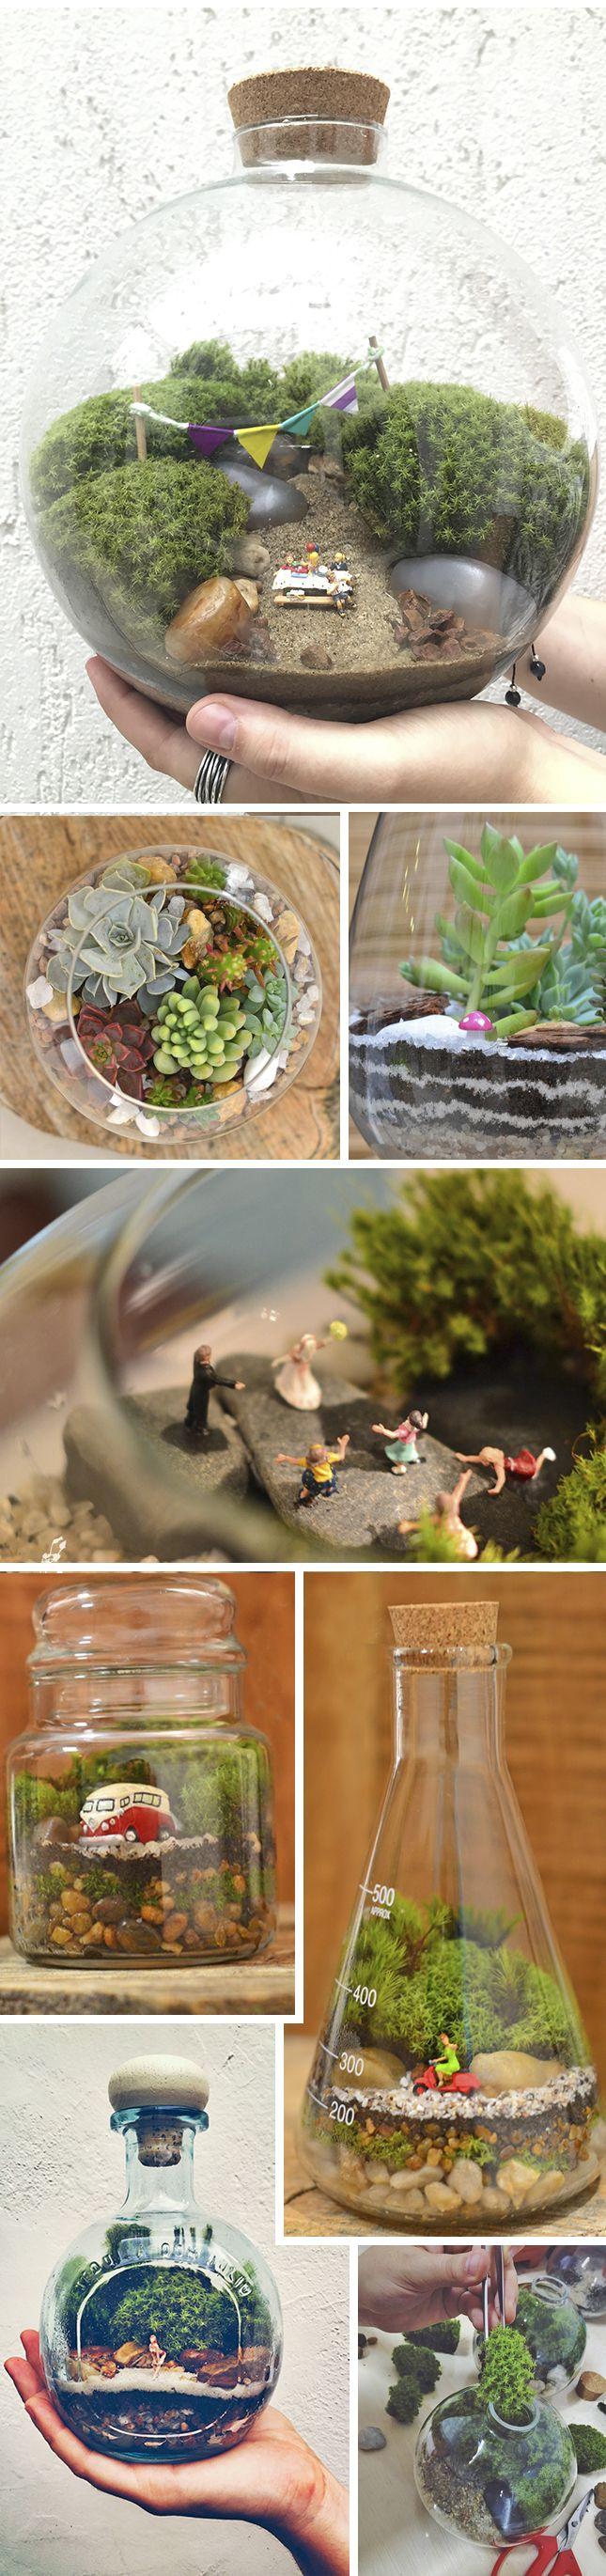 Decnet Recomenda: Jardim no Pote